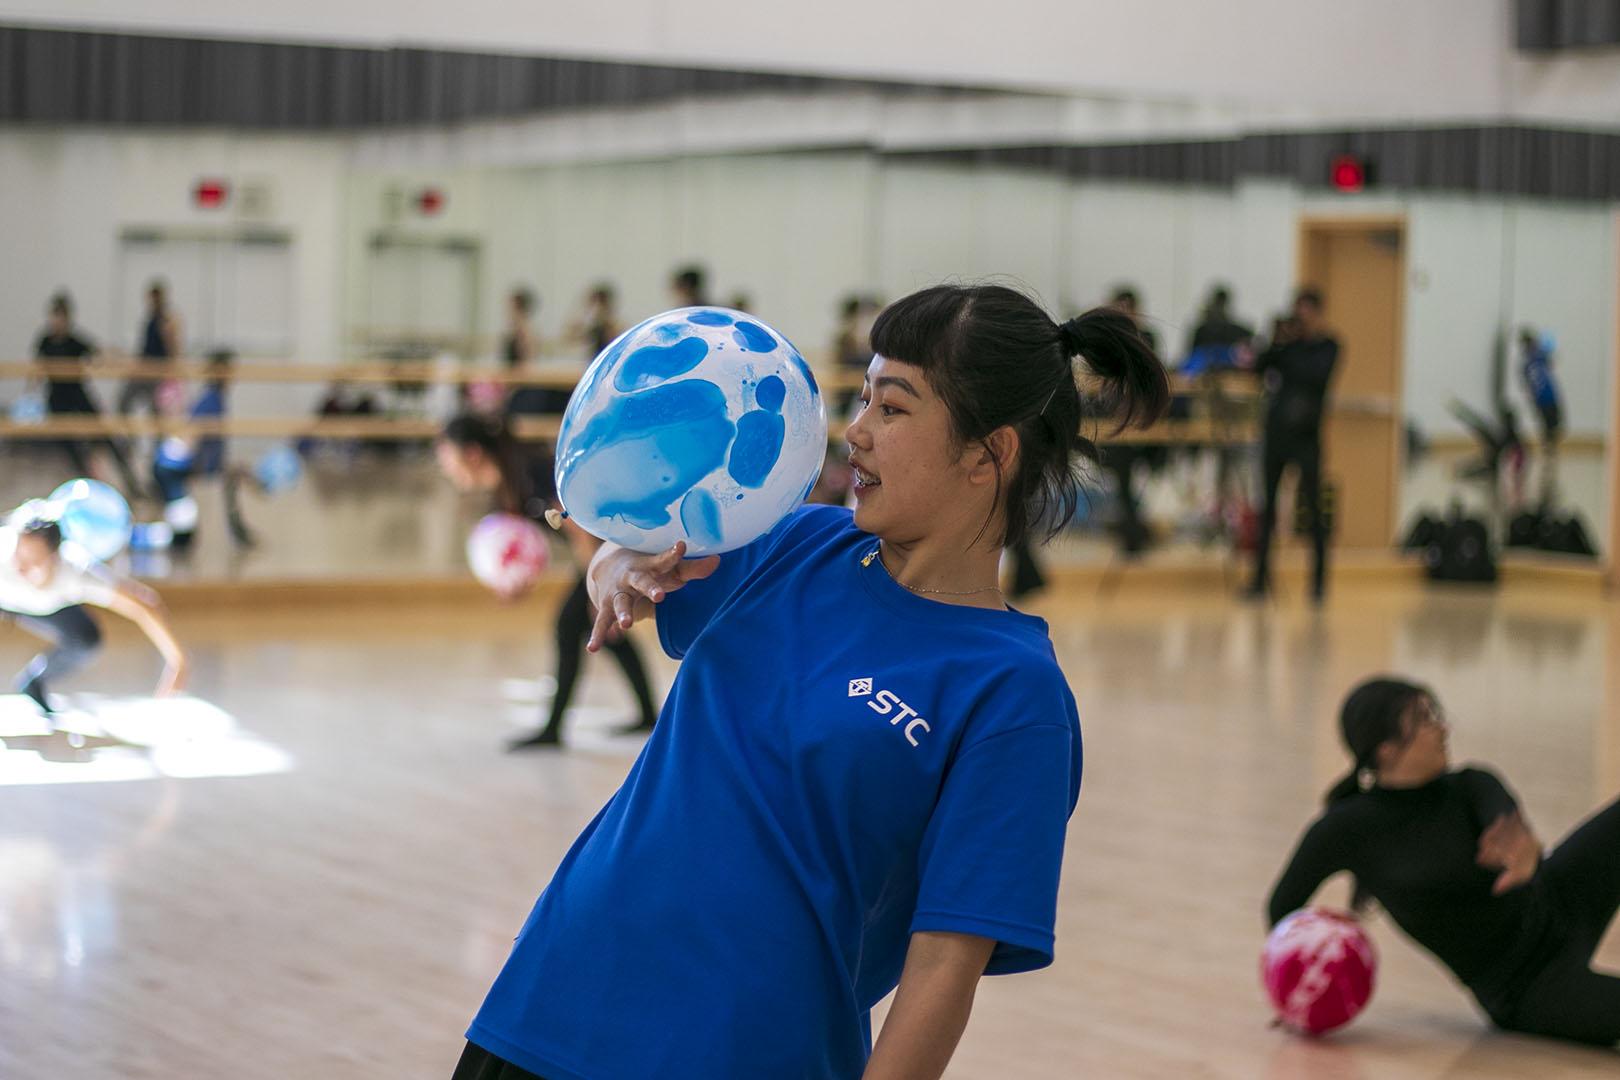 Dance improvisation routine with balloon. Photo Credit: Shannon Carter/SAC.Media